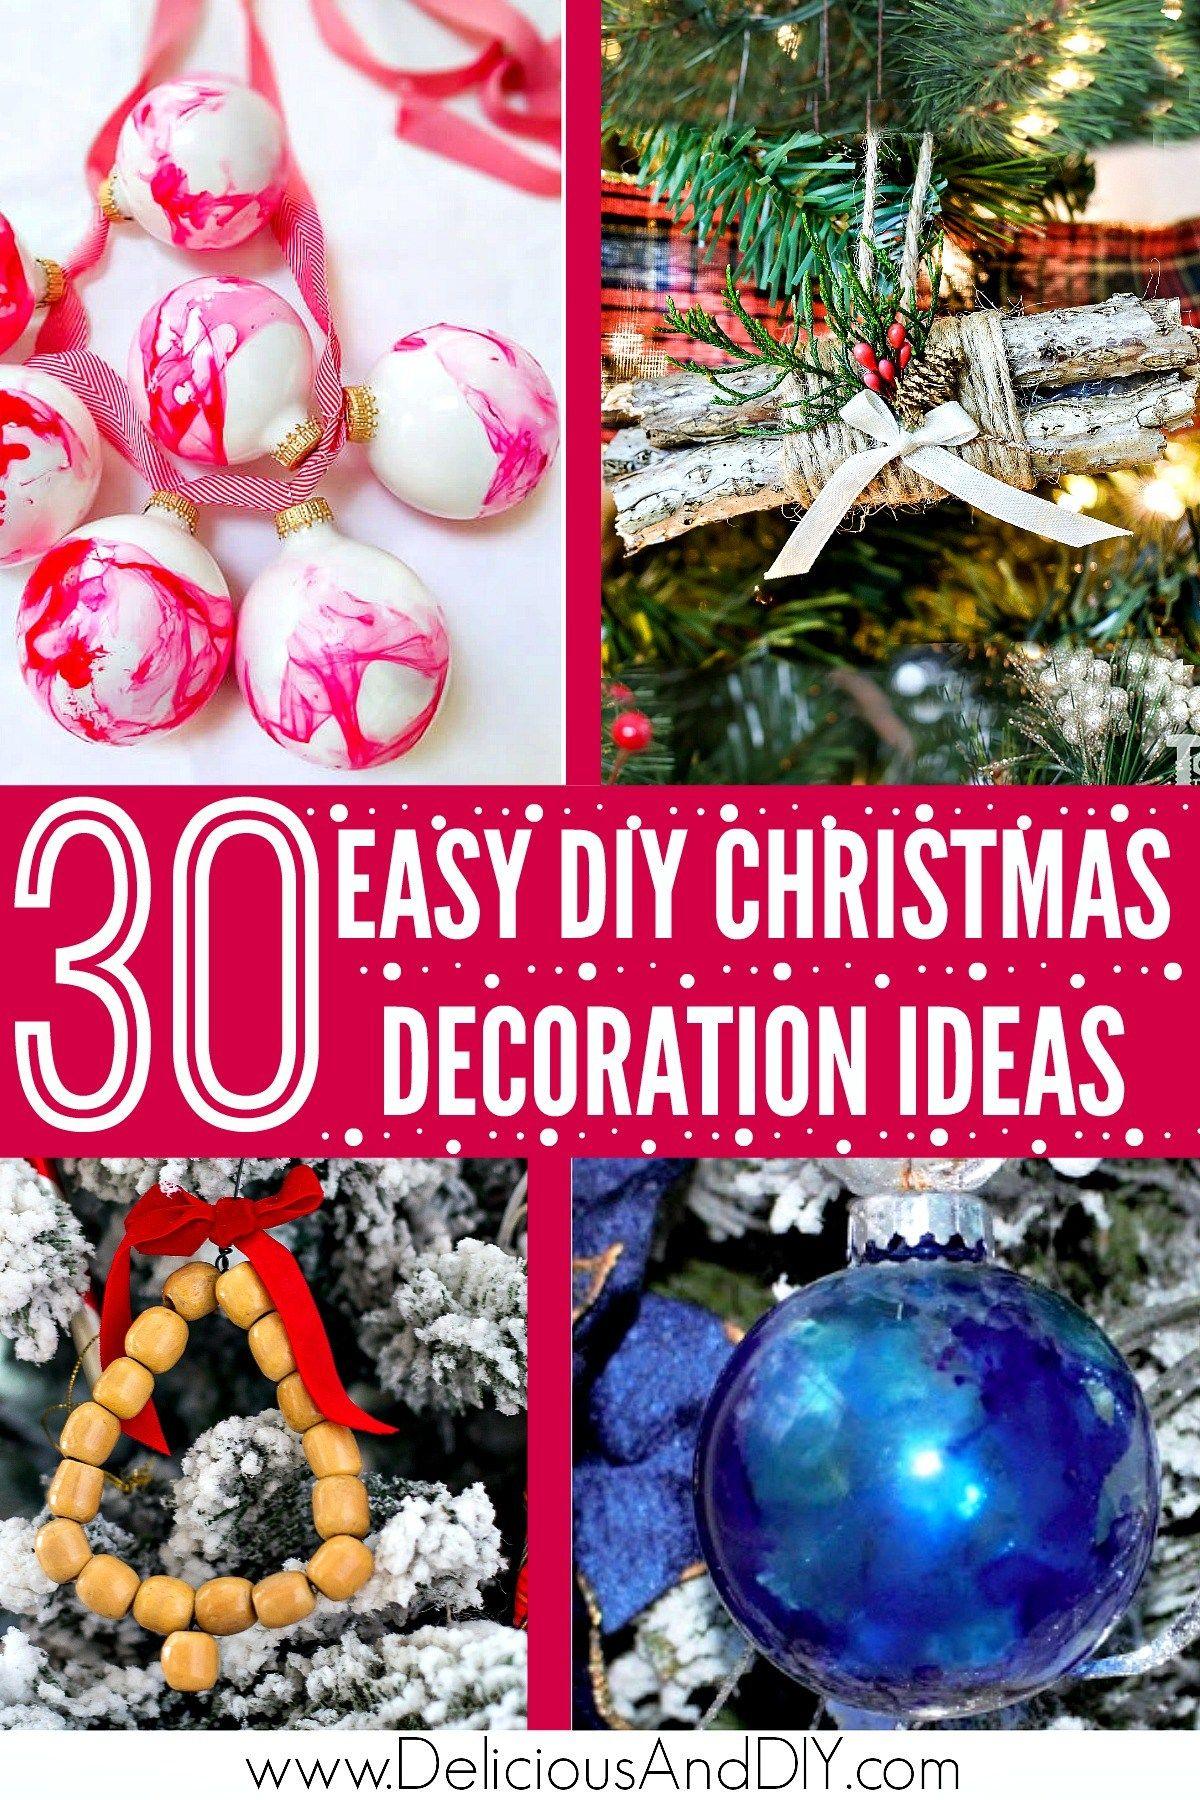 30 Gorgeous Diy Christmas Decoration Ideas Delicious And Diy Diy Christmas Decorations Easy Easy Christmas Diy Diy Christmas Tree Ornaments